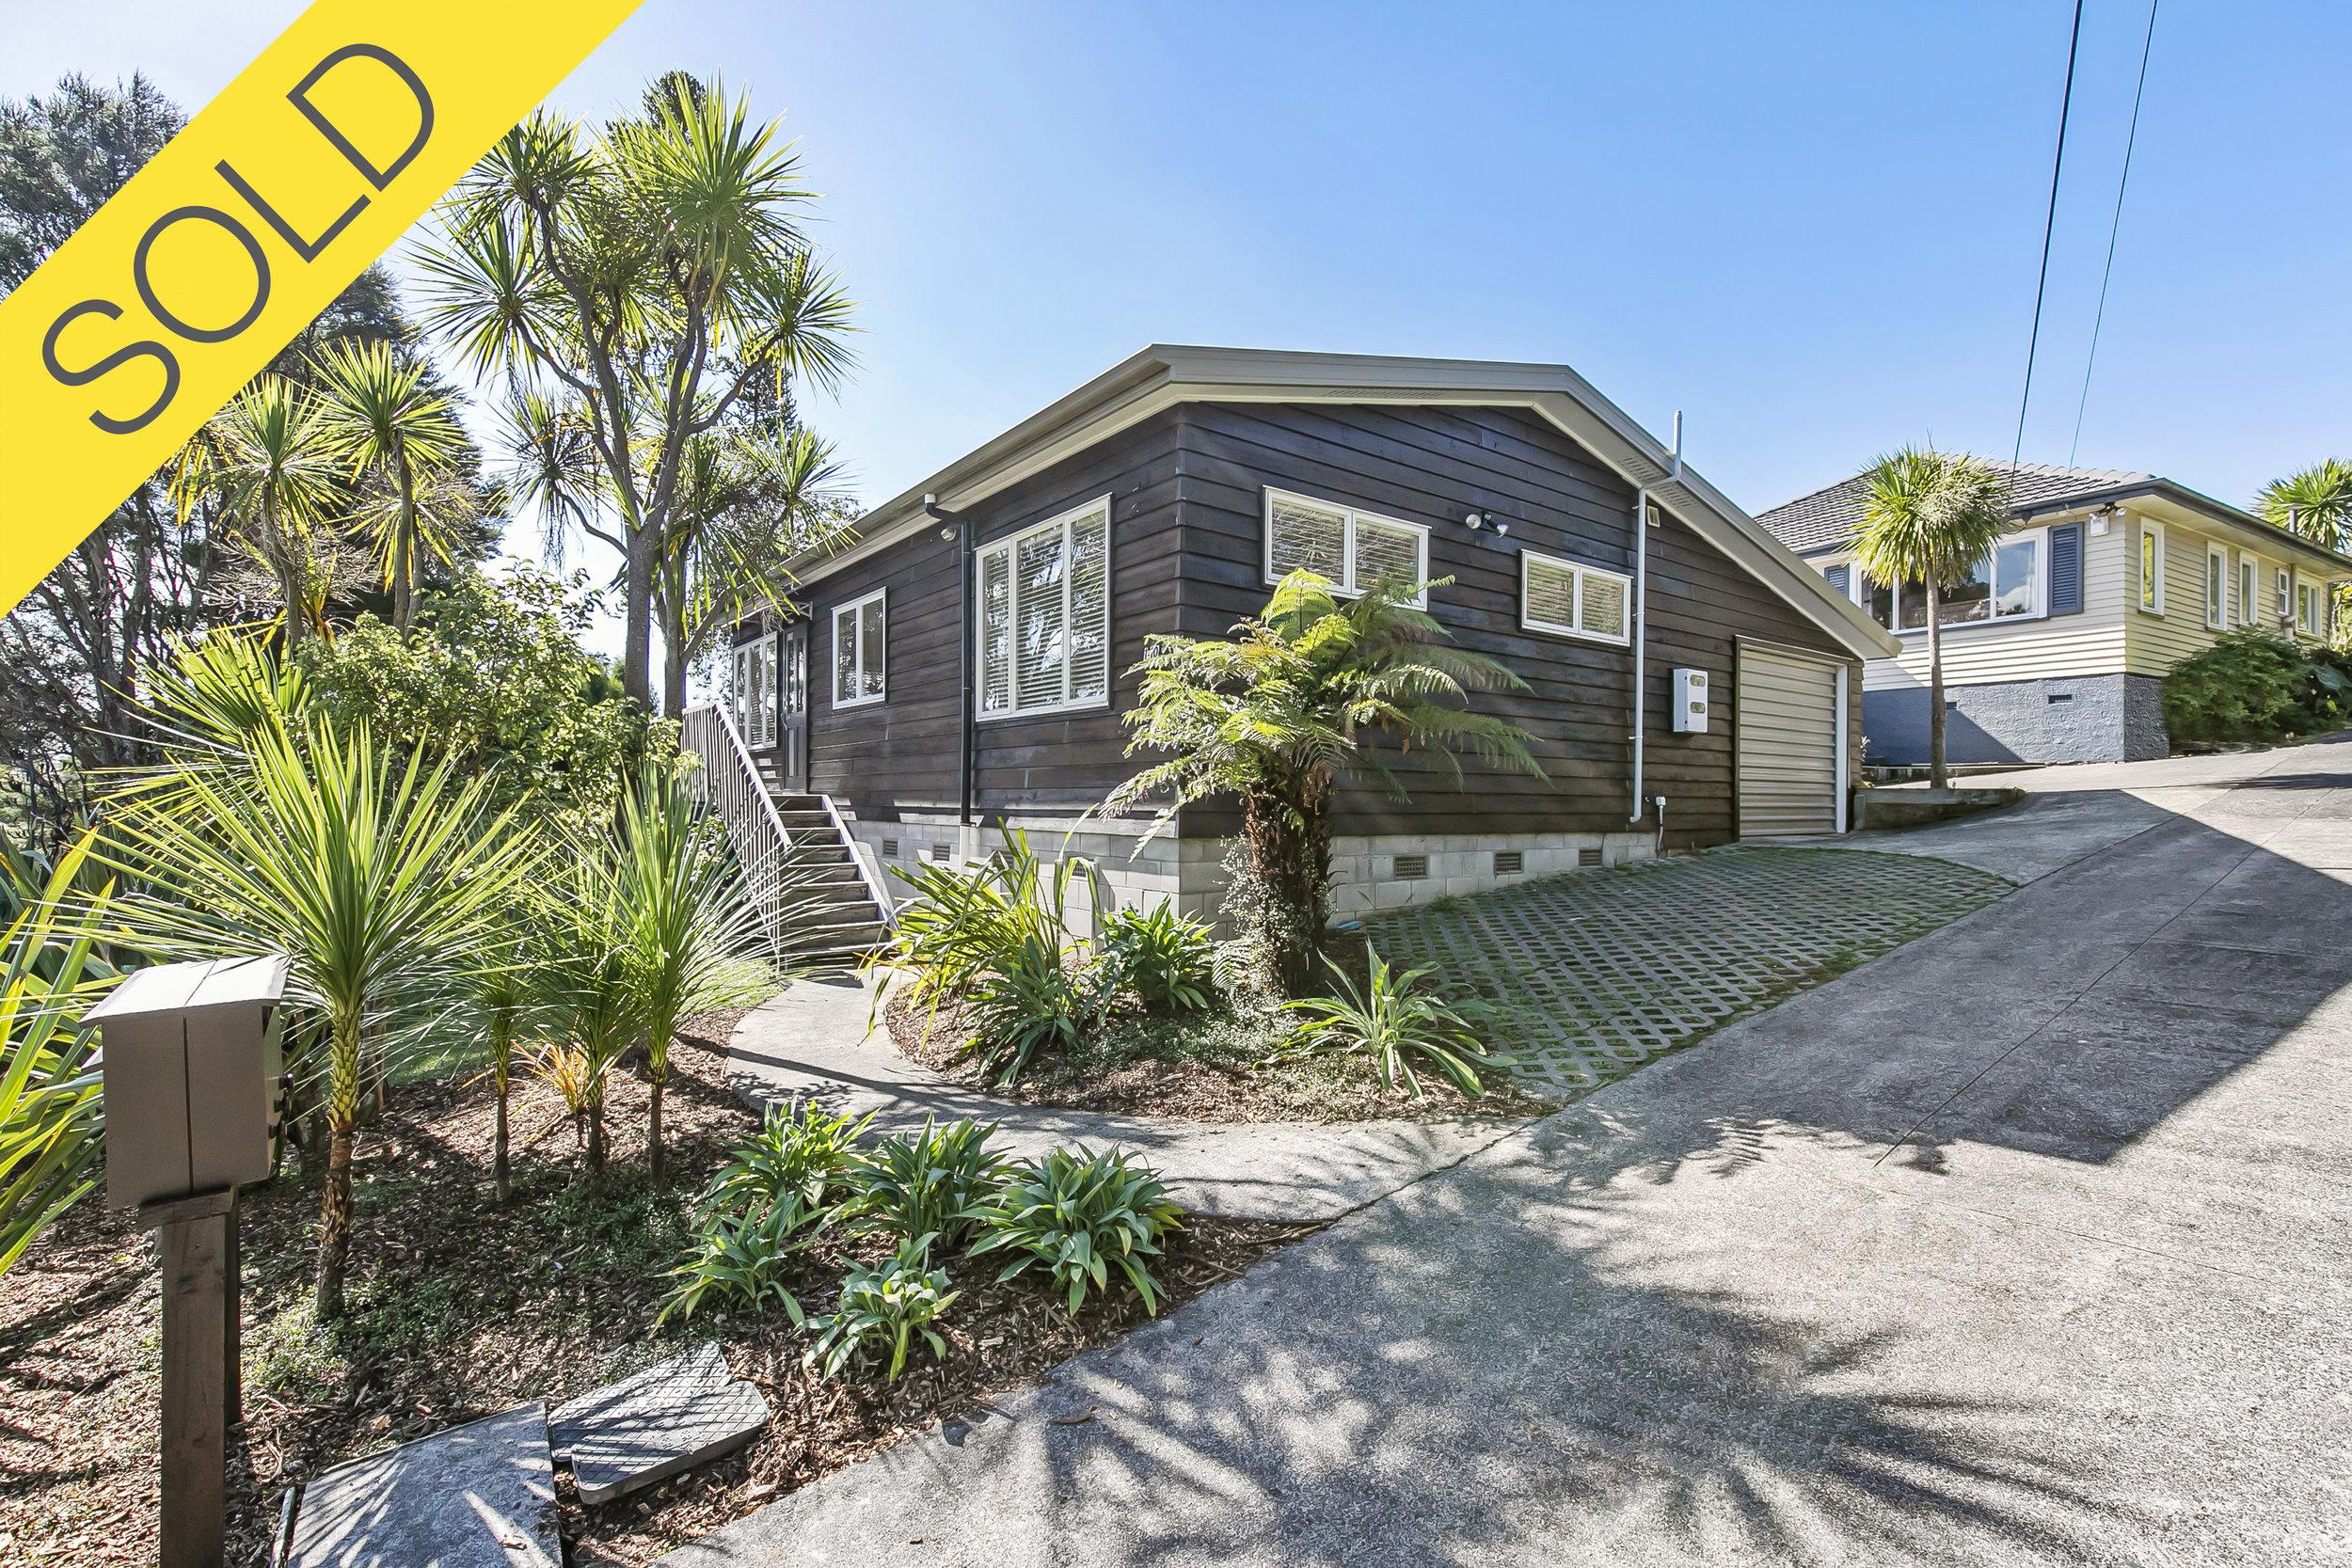 1/10 Konini Road, Titirangi, Auckland - SOLD MAY 20192 Beds I 1 Baths I 1 Car